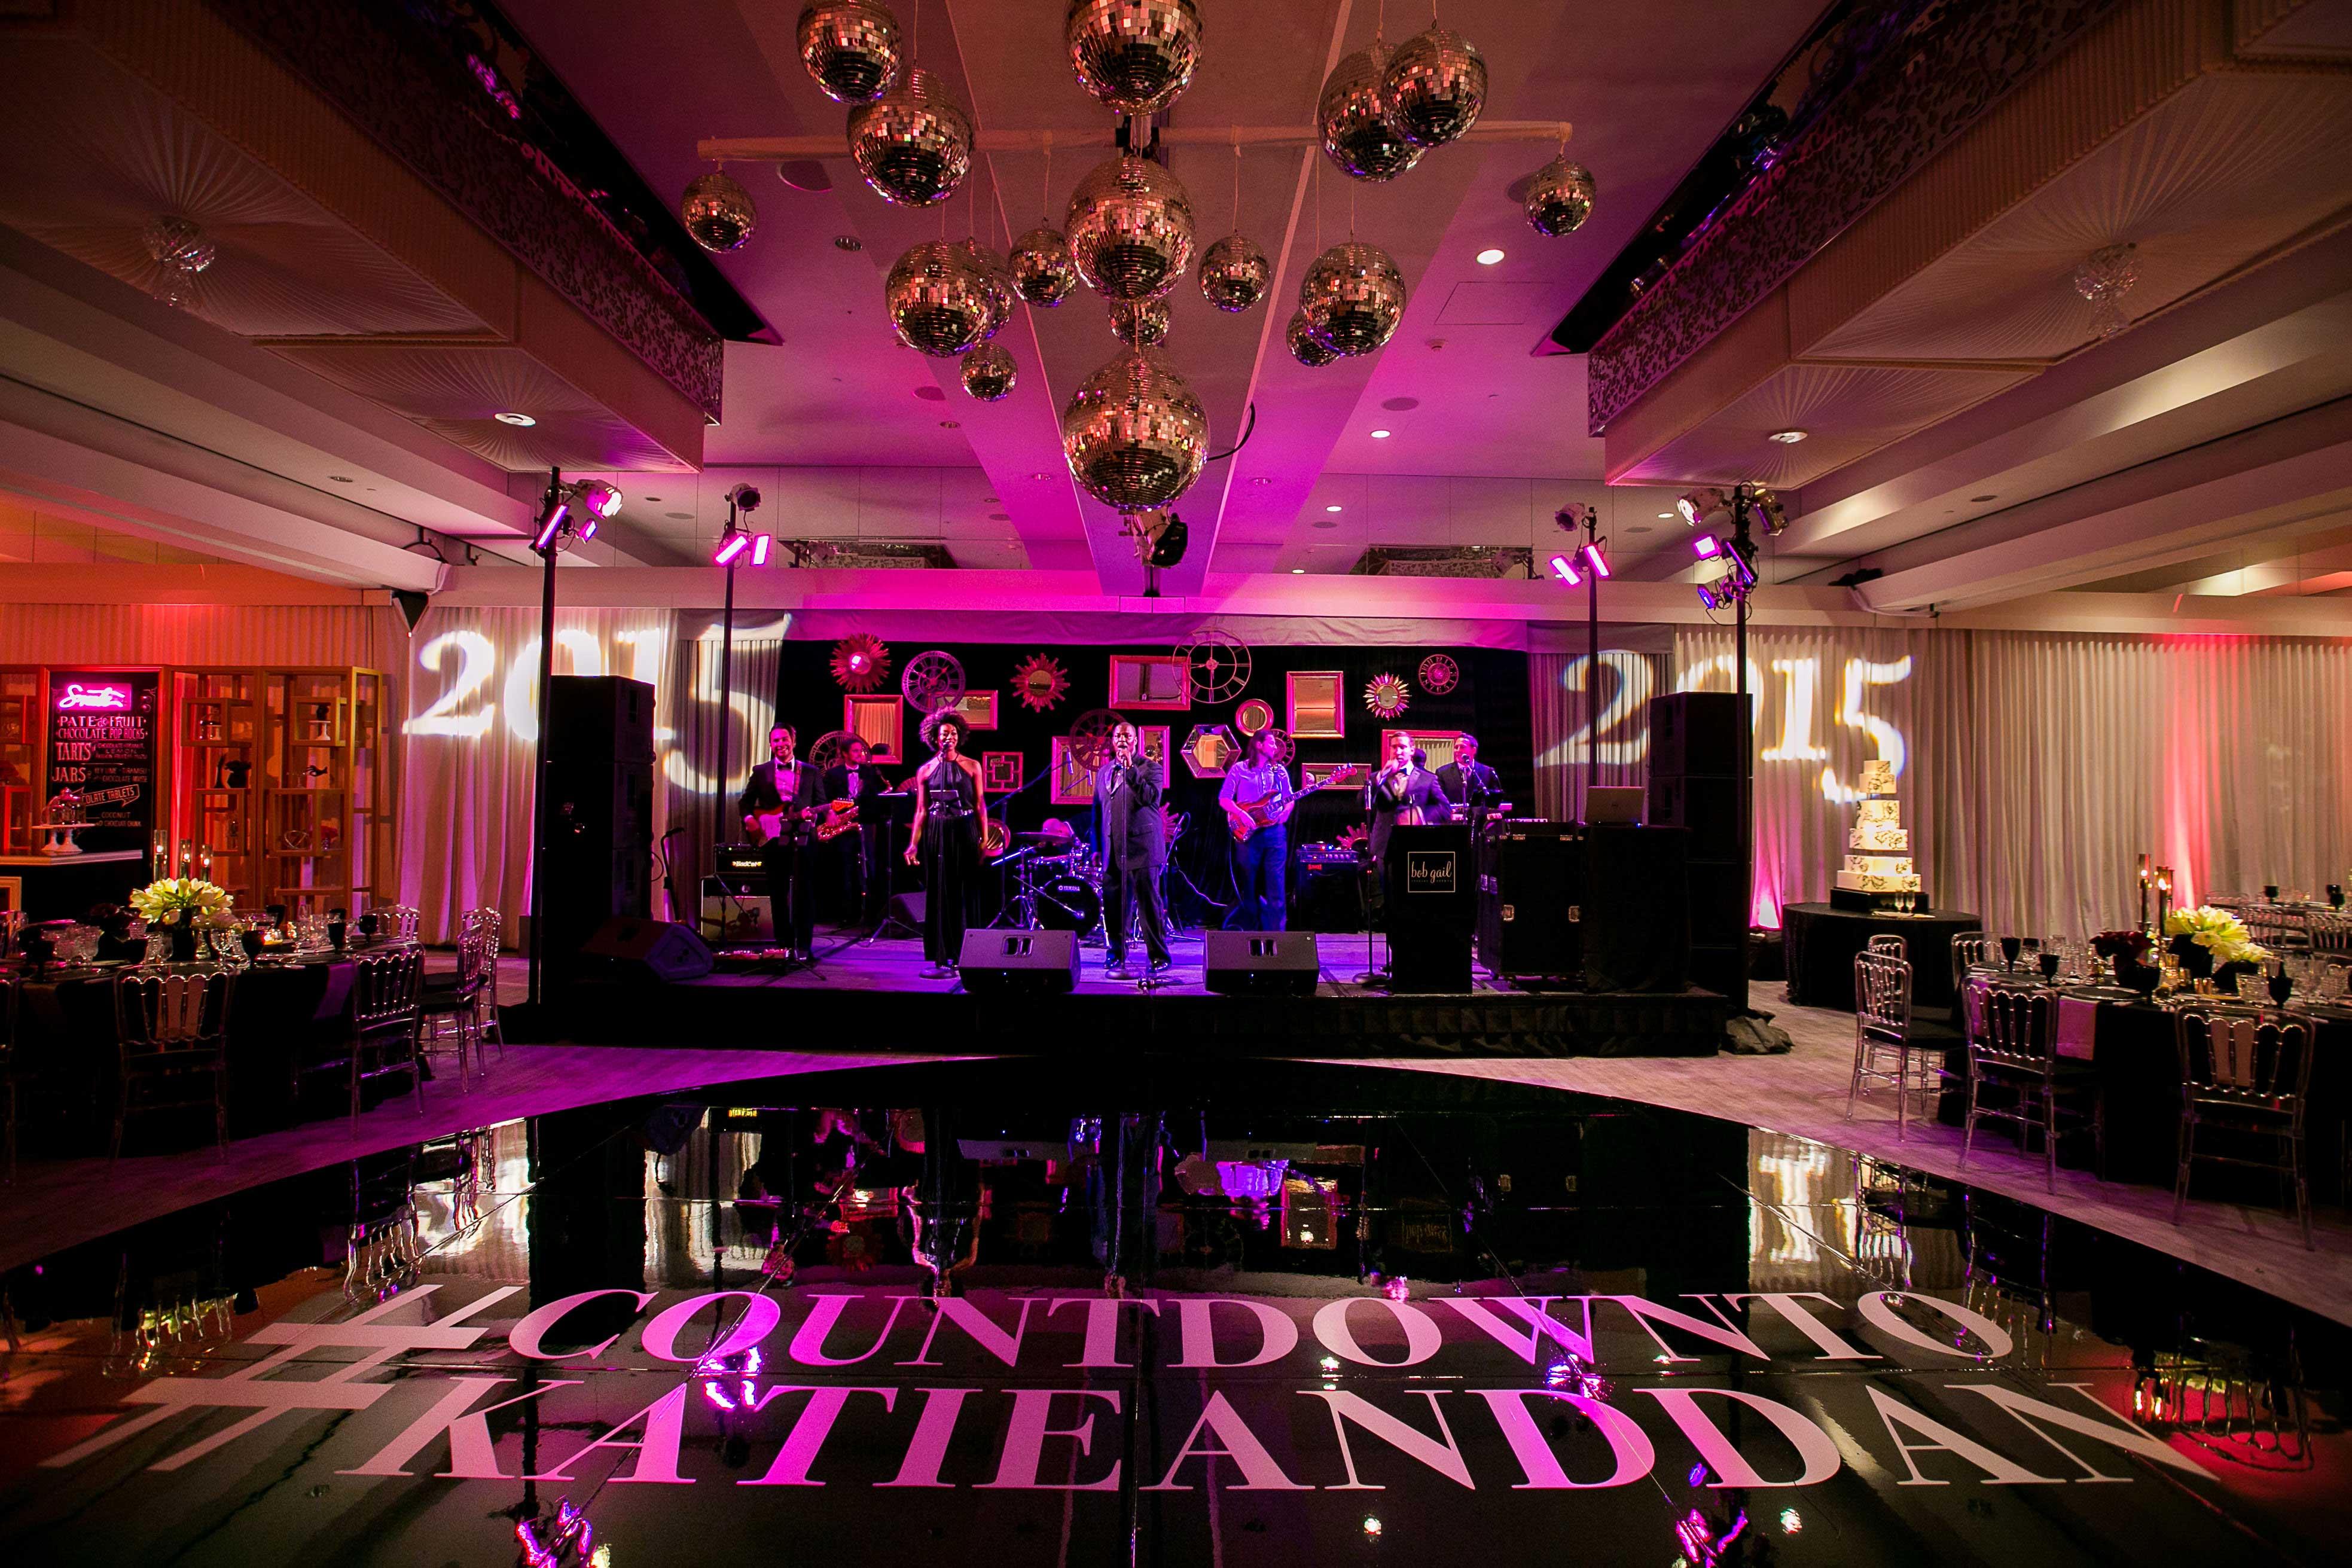 New Year's Eve dark wedding reception